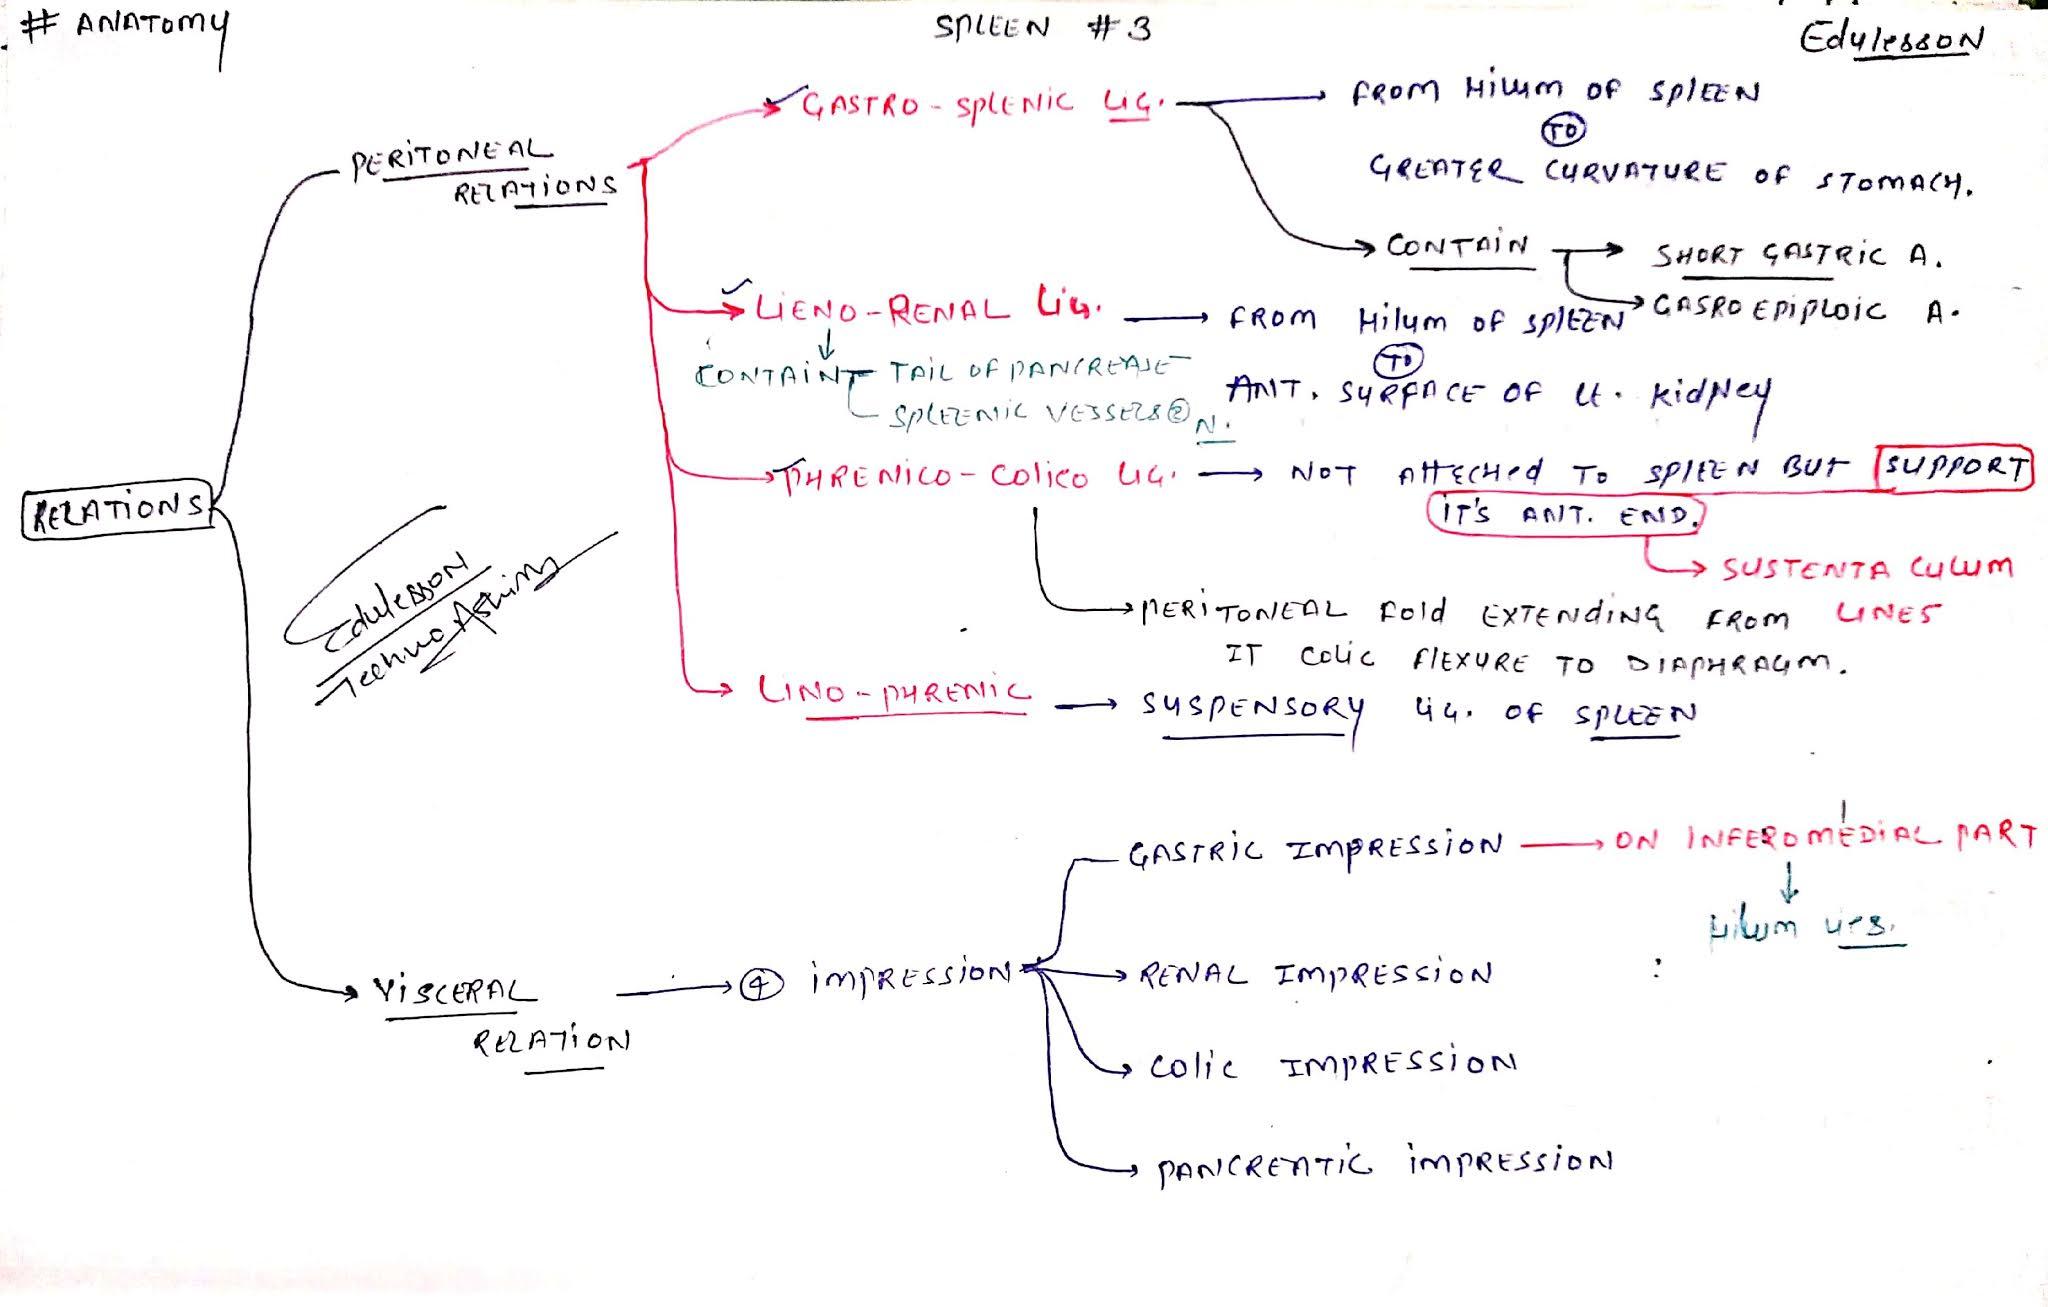 Anatomy of Spleen 3 - Peritoneal Relation, Visceral Relation (EduLesson)